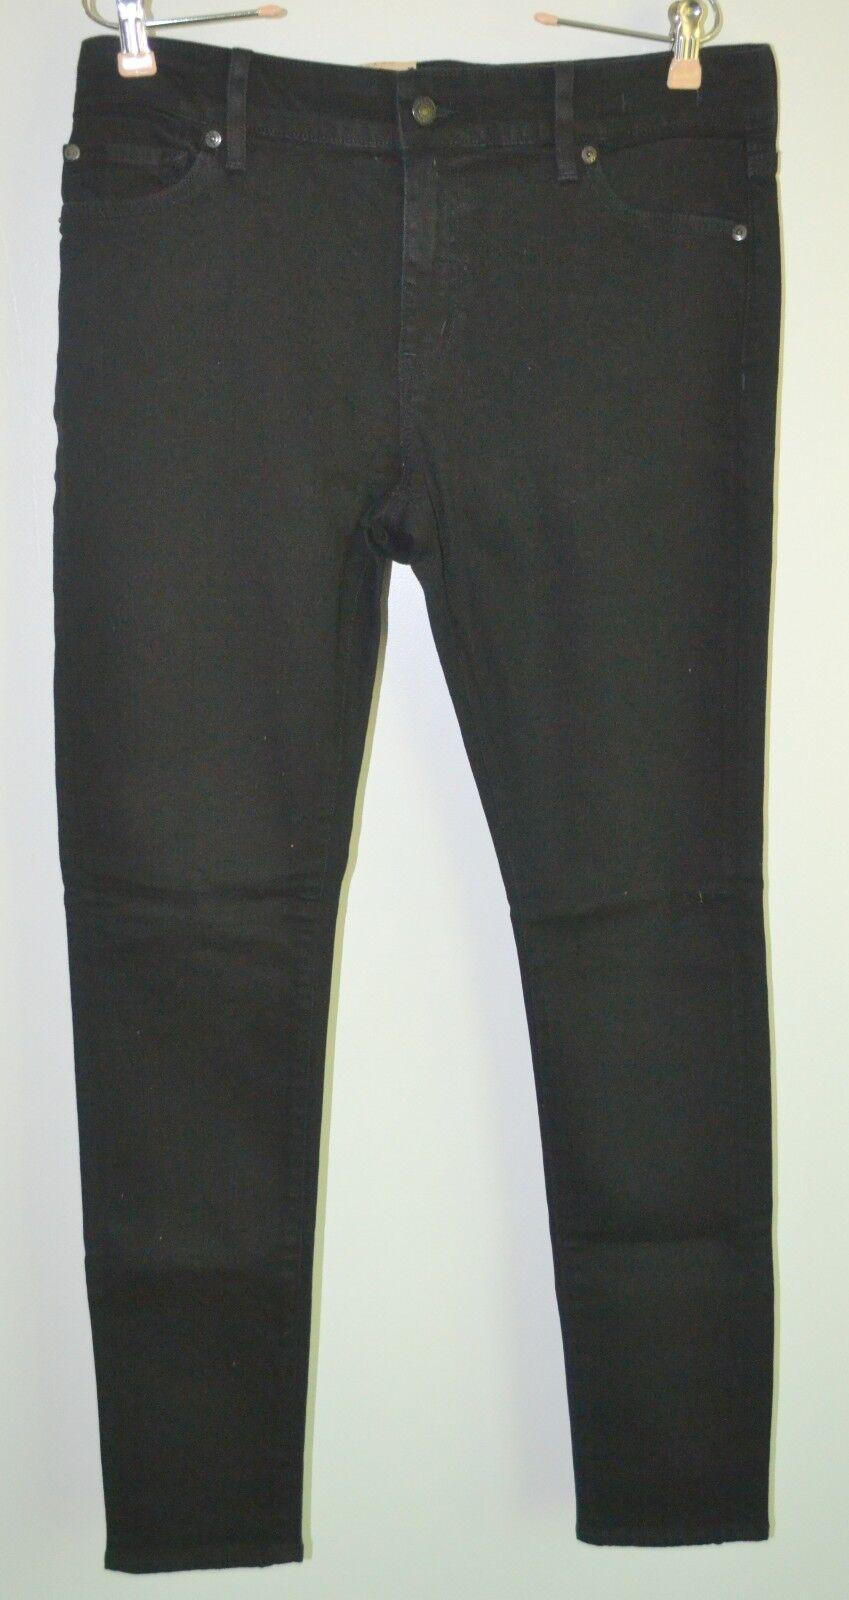 Denim & Supply, Ralph Lauren, Jeans, WW151 Core, Reiser, 32 x 32, skinny